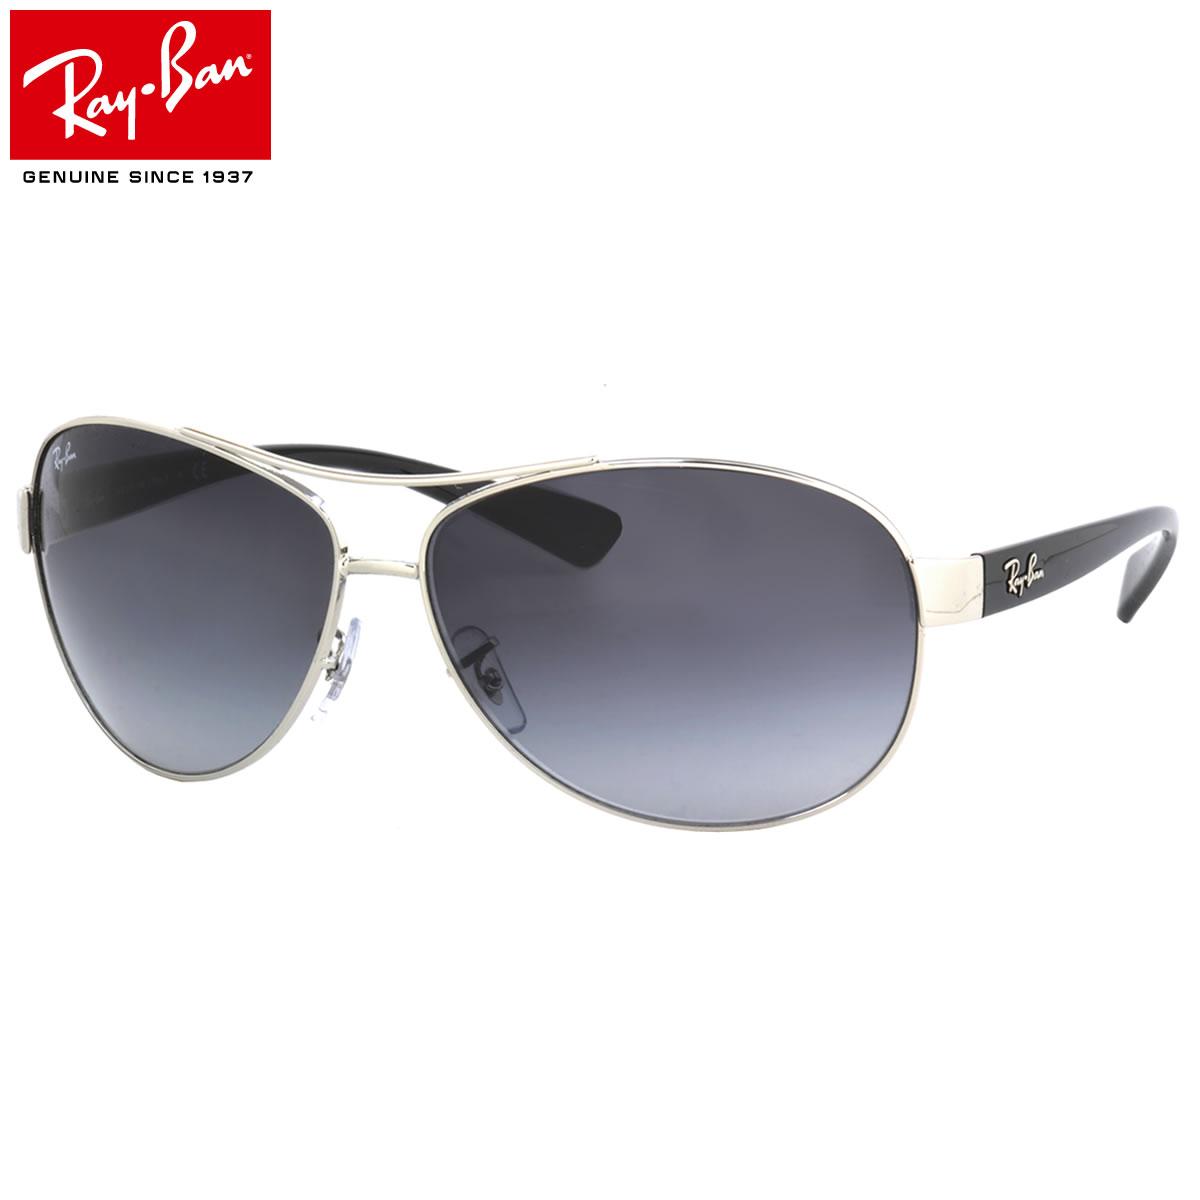 573e6e3412c Optical Shop Thats  Ray-Ban Sunglasses RB3386 003 8G 67size GENUINE ...